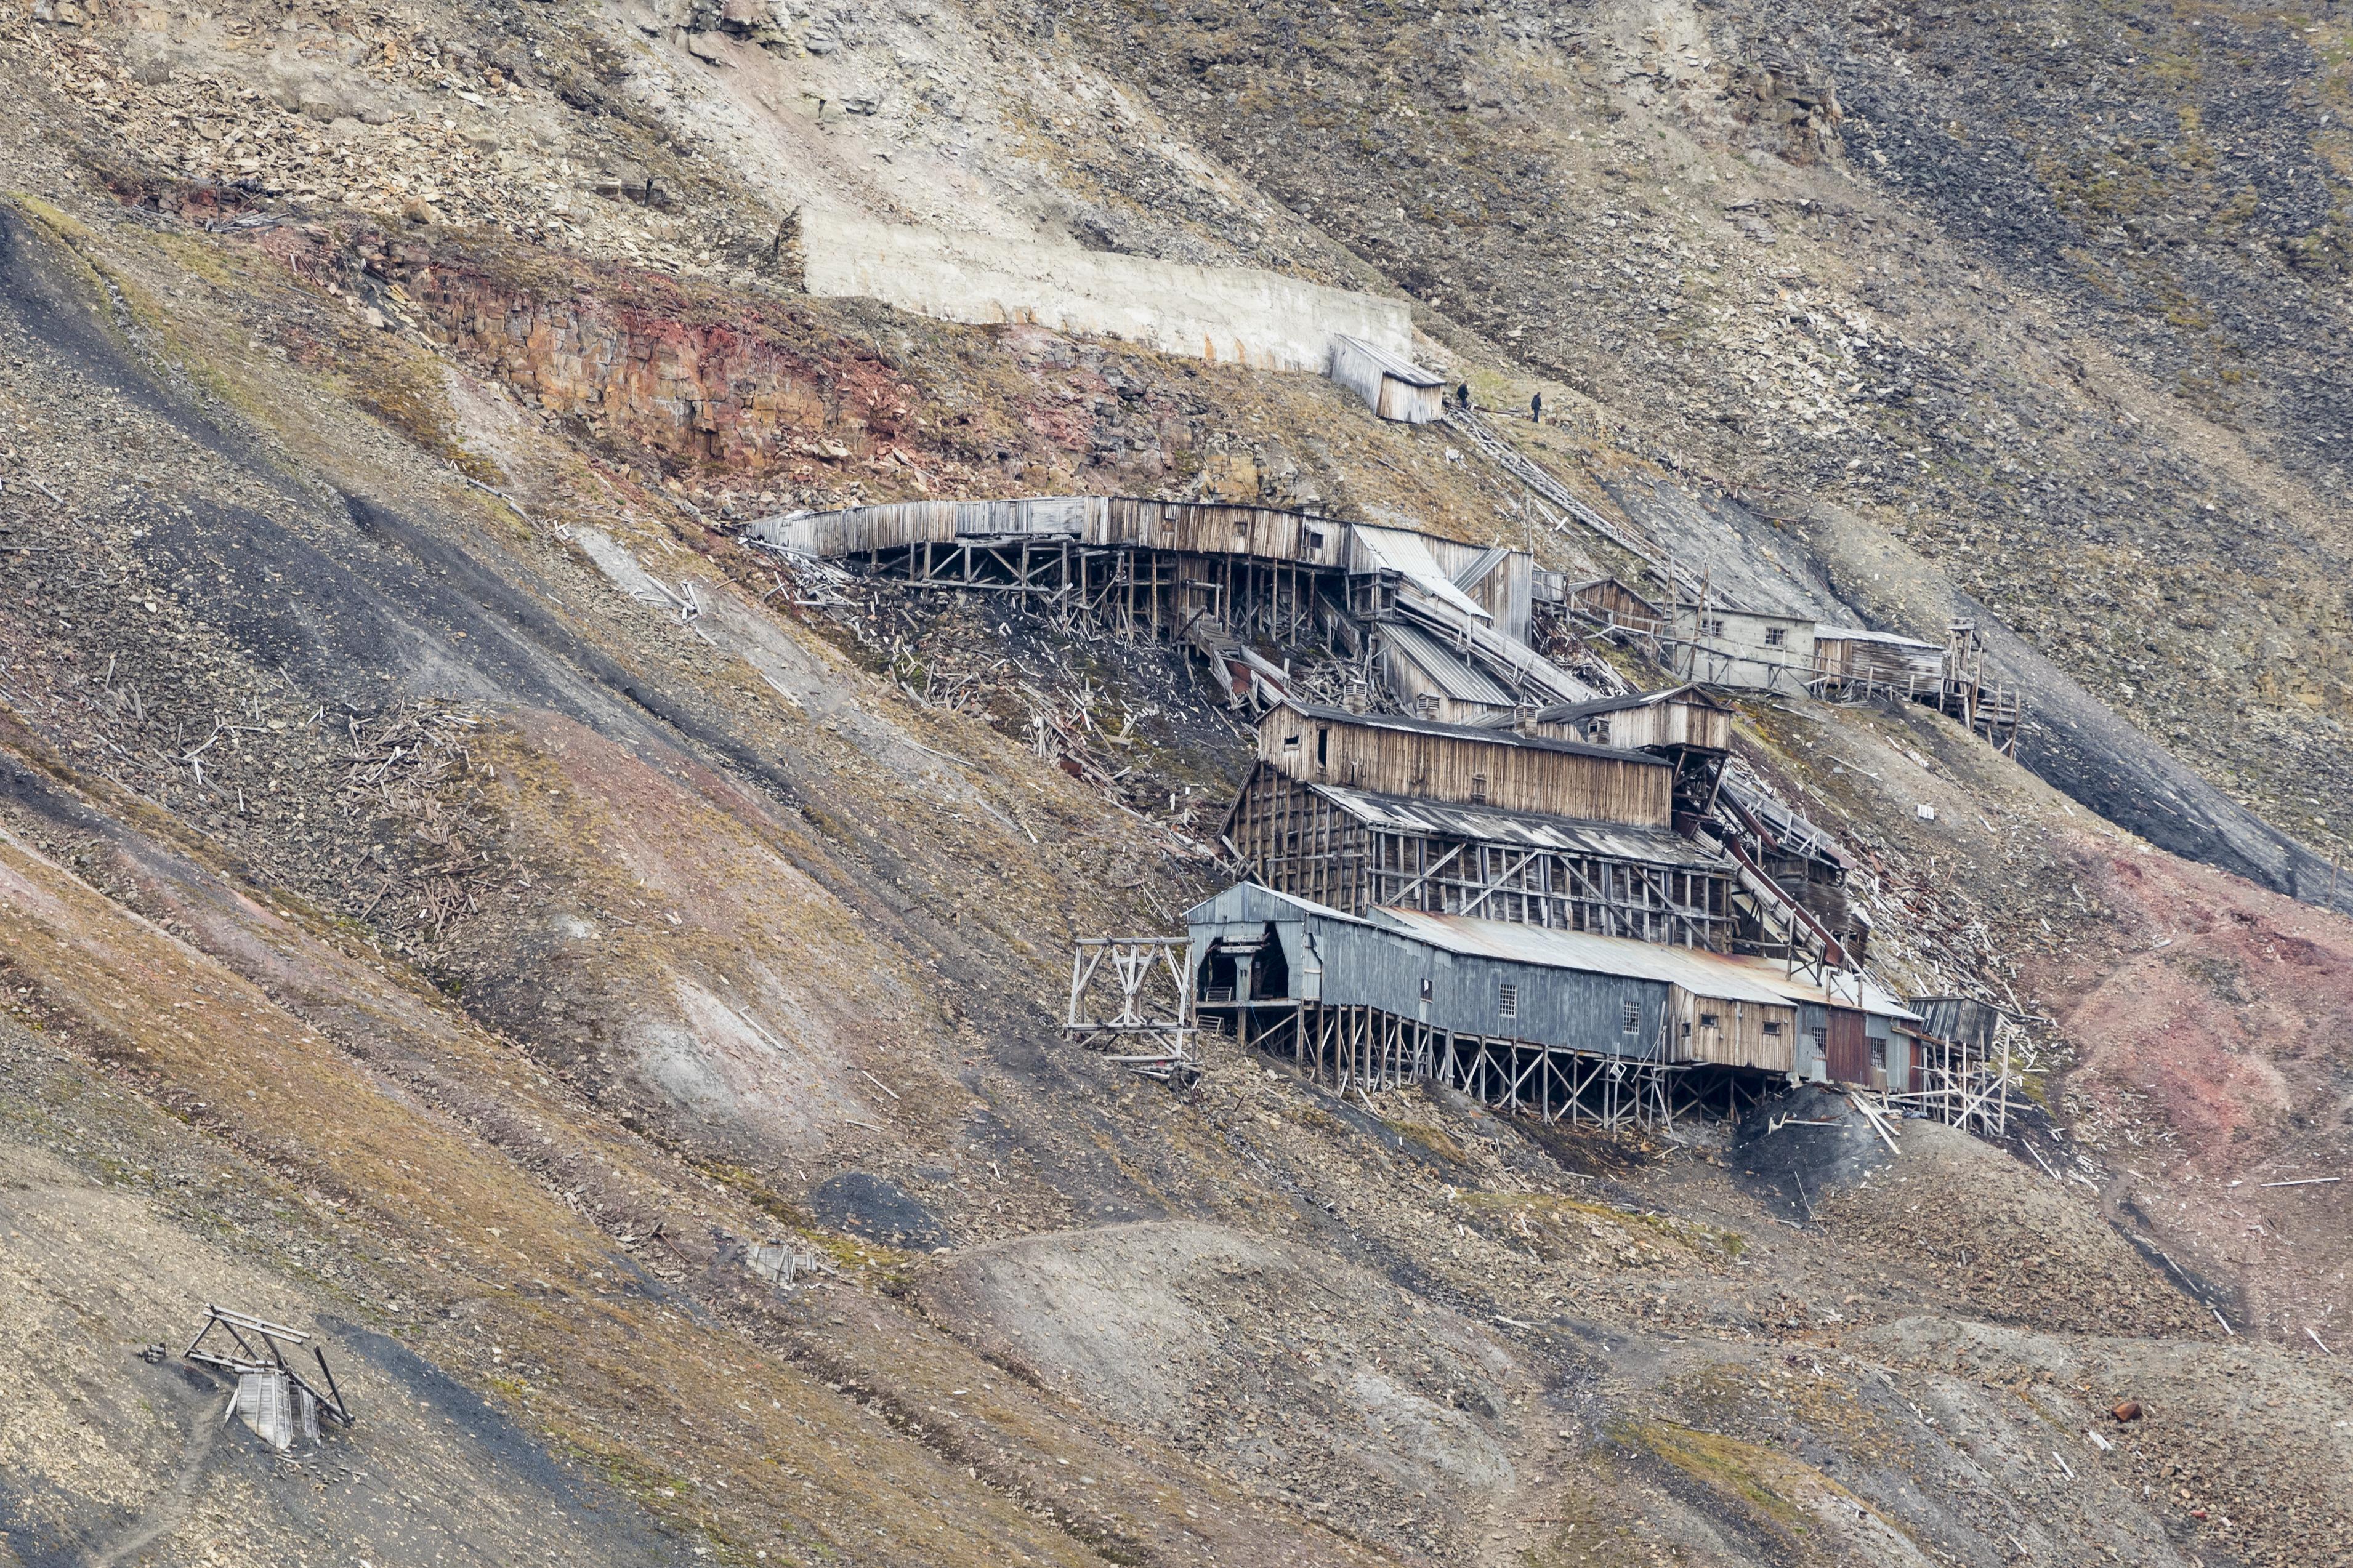 File:NOR-2016-Svalbard-Longyearbyen-No 2b Mine 02.jpg - Wikimedia Commons